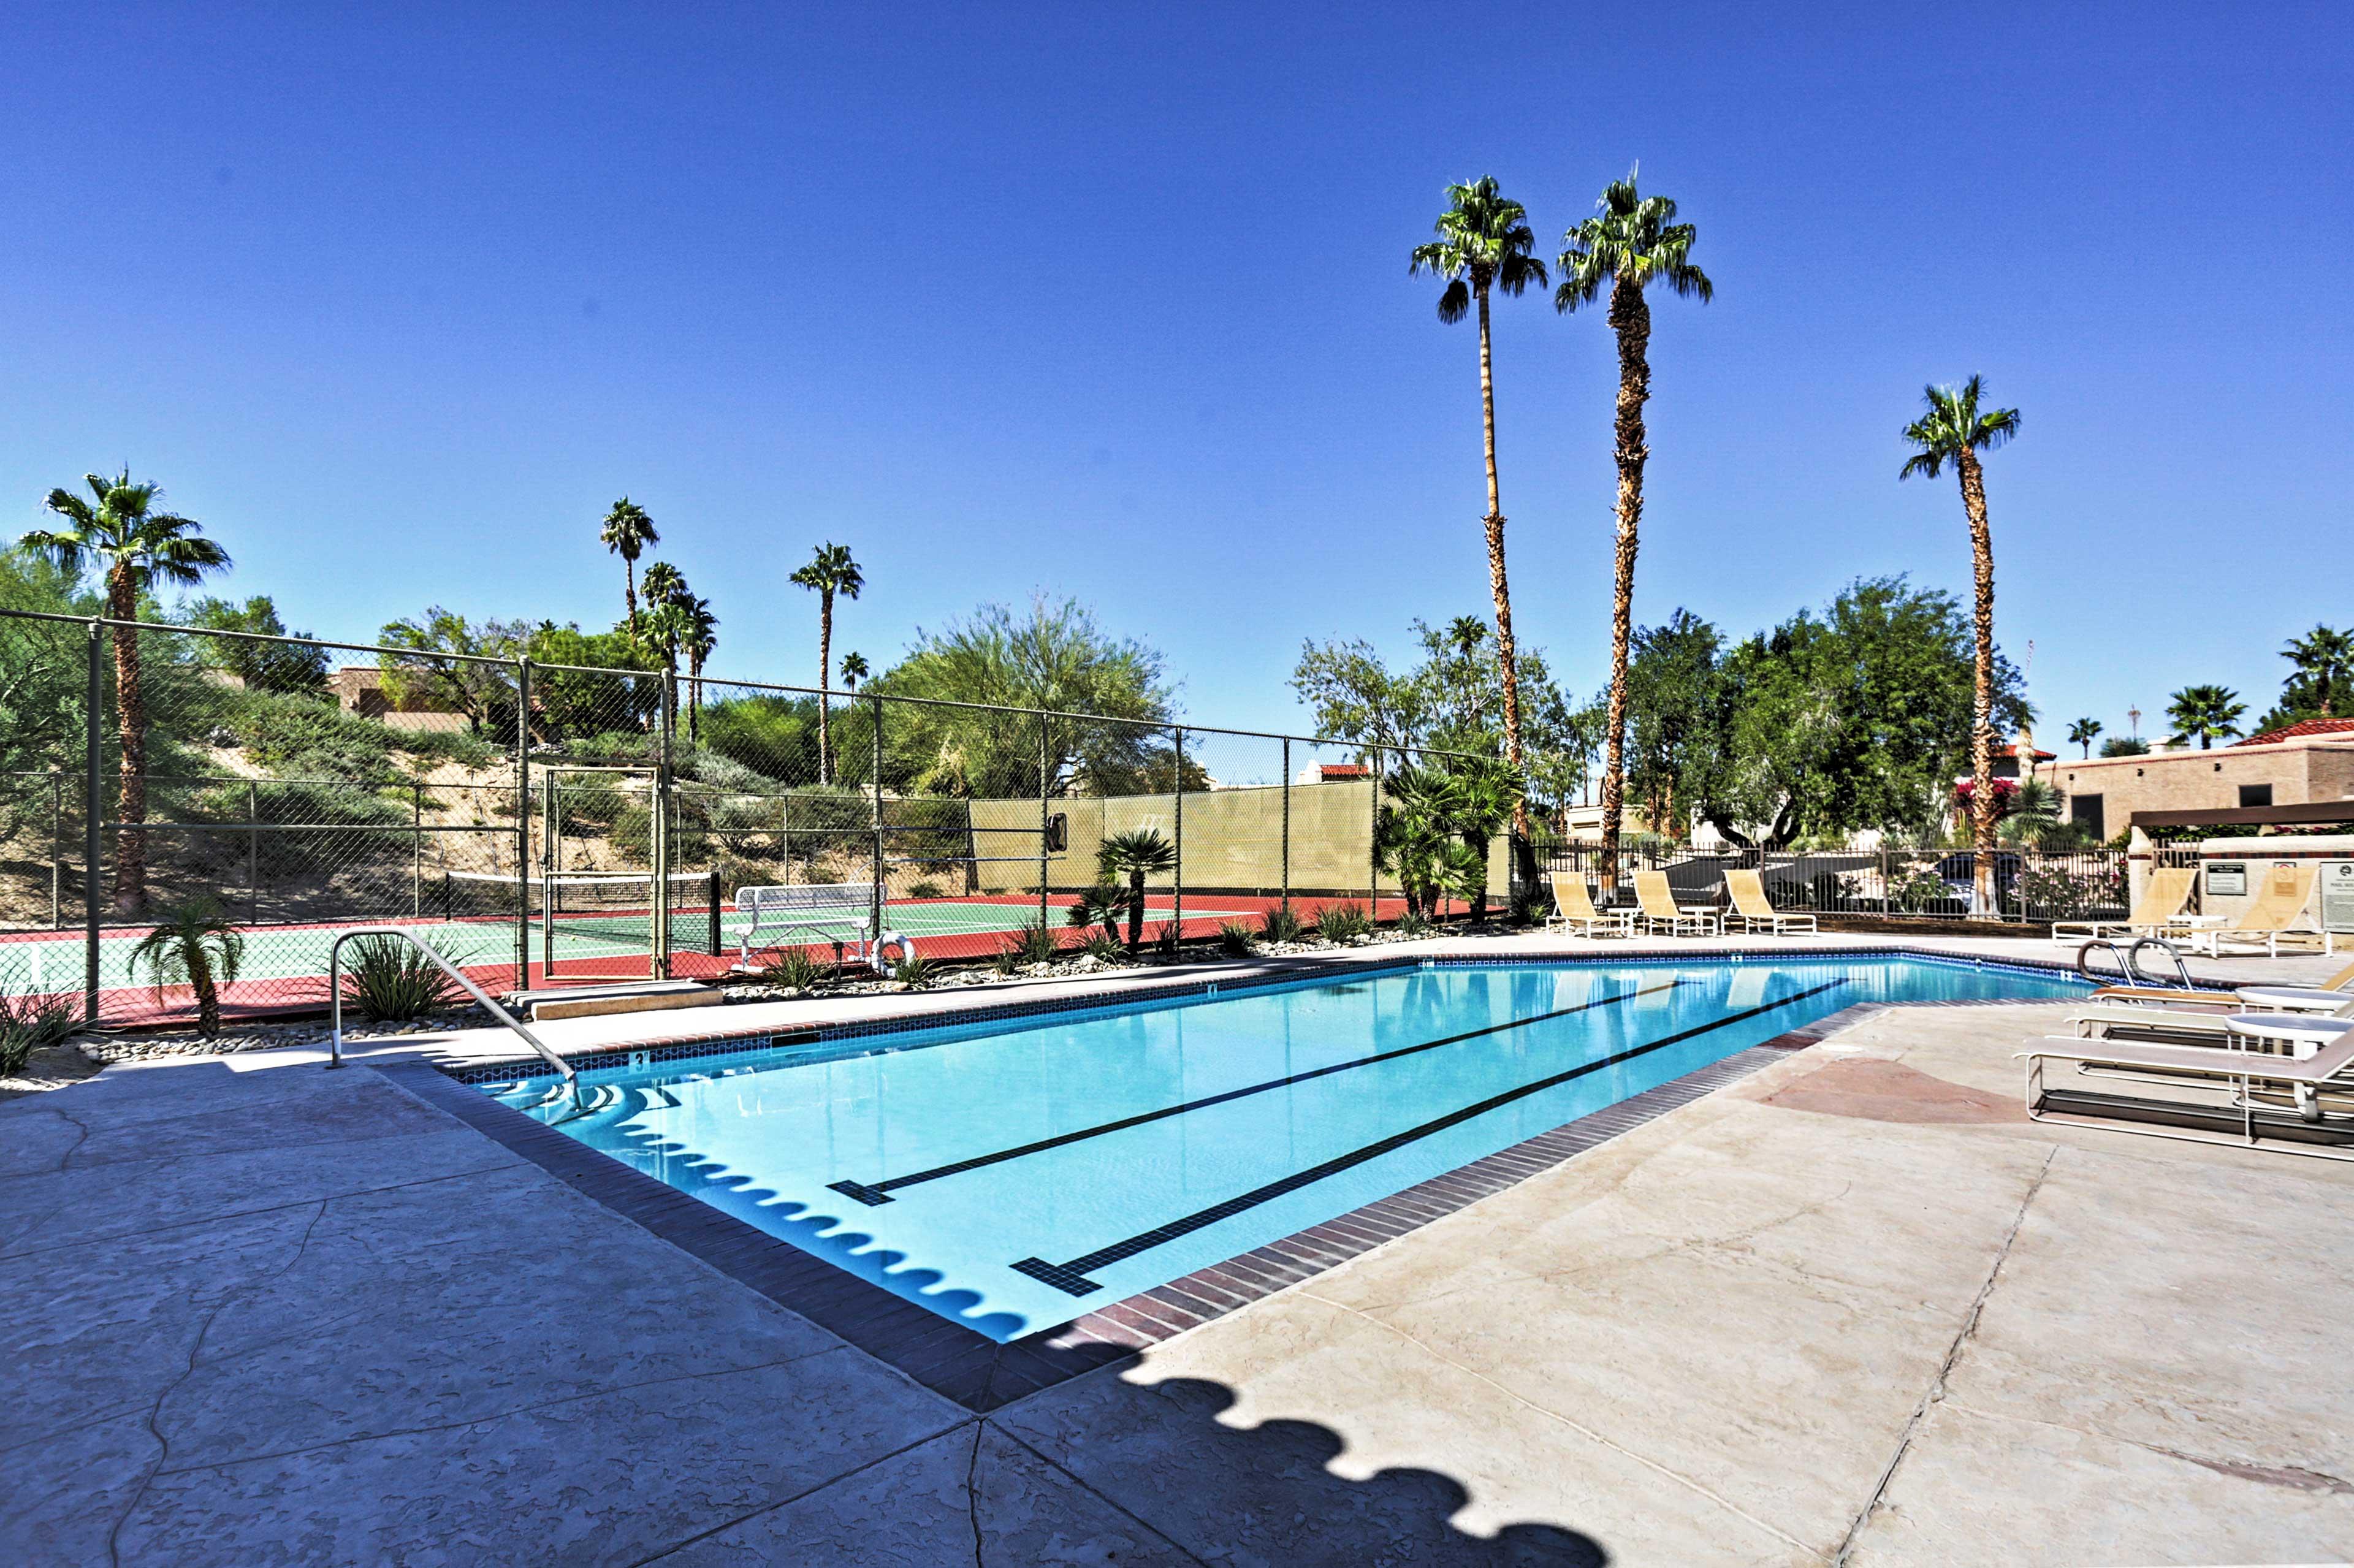 Soak up that California sunshine at the community swimming pool.